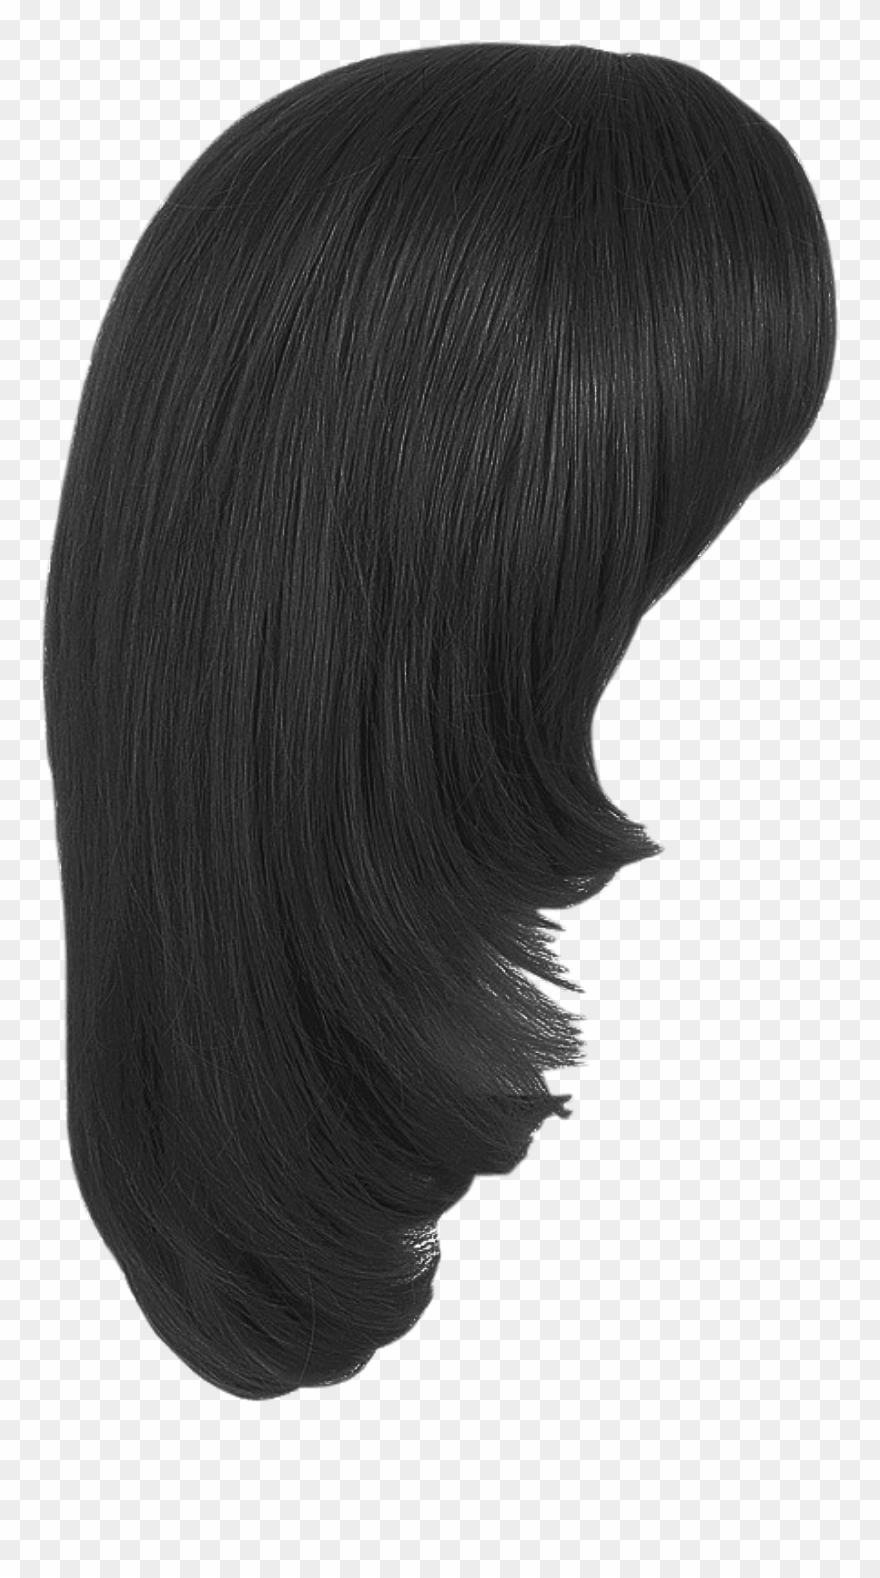 Girl Hair Png Transparent Image.